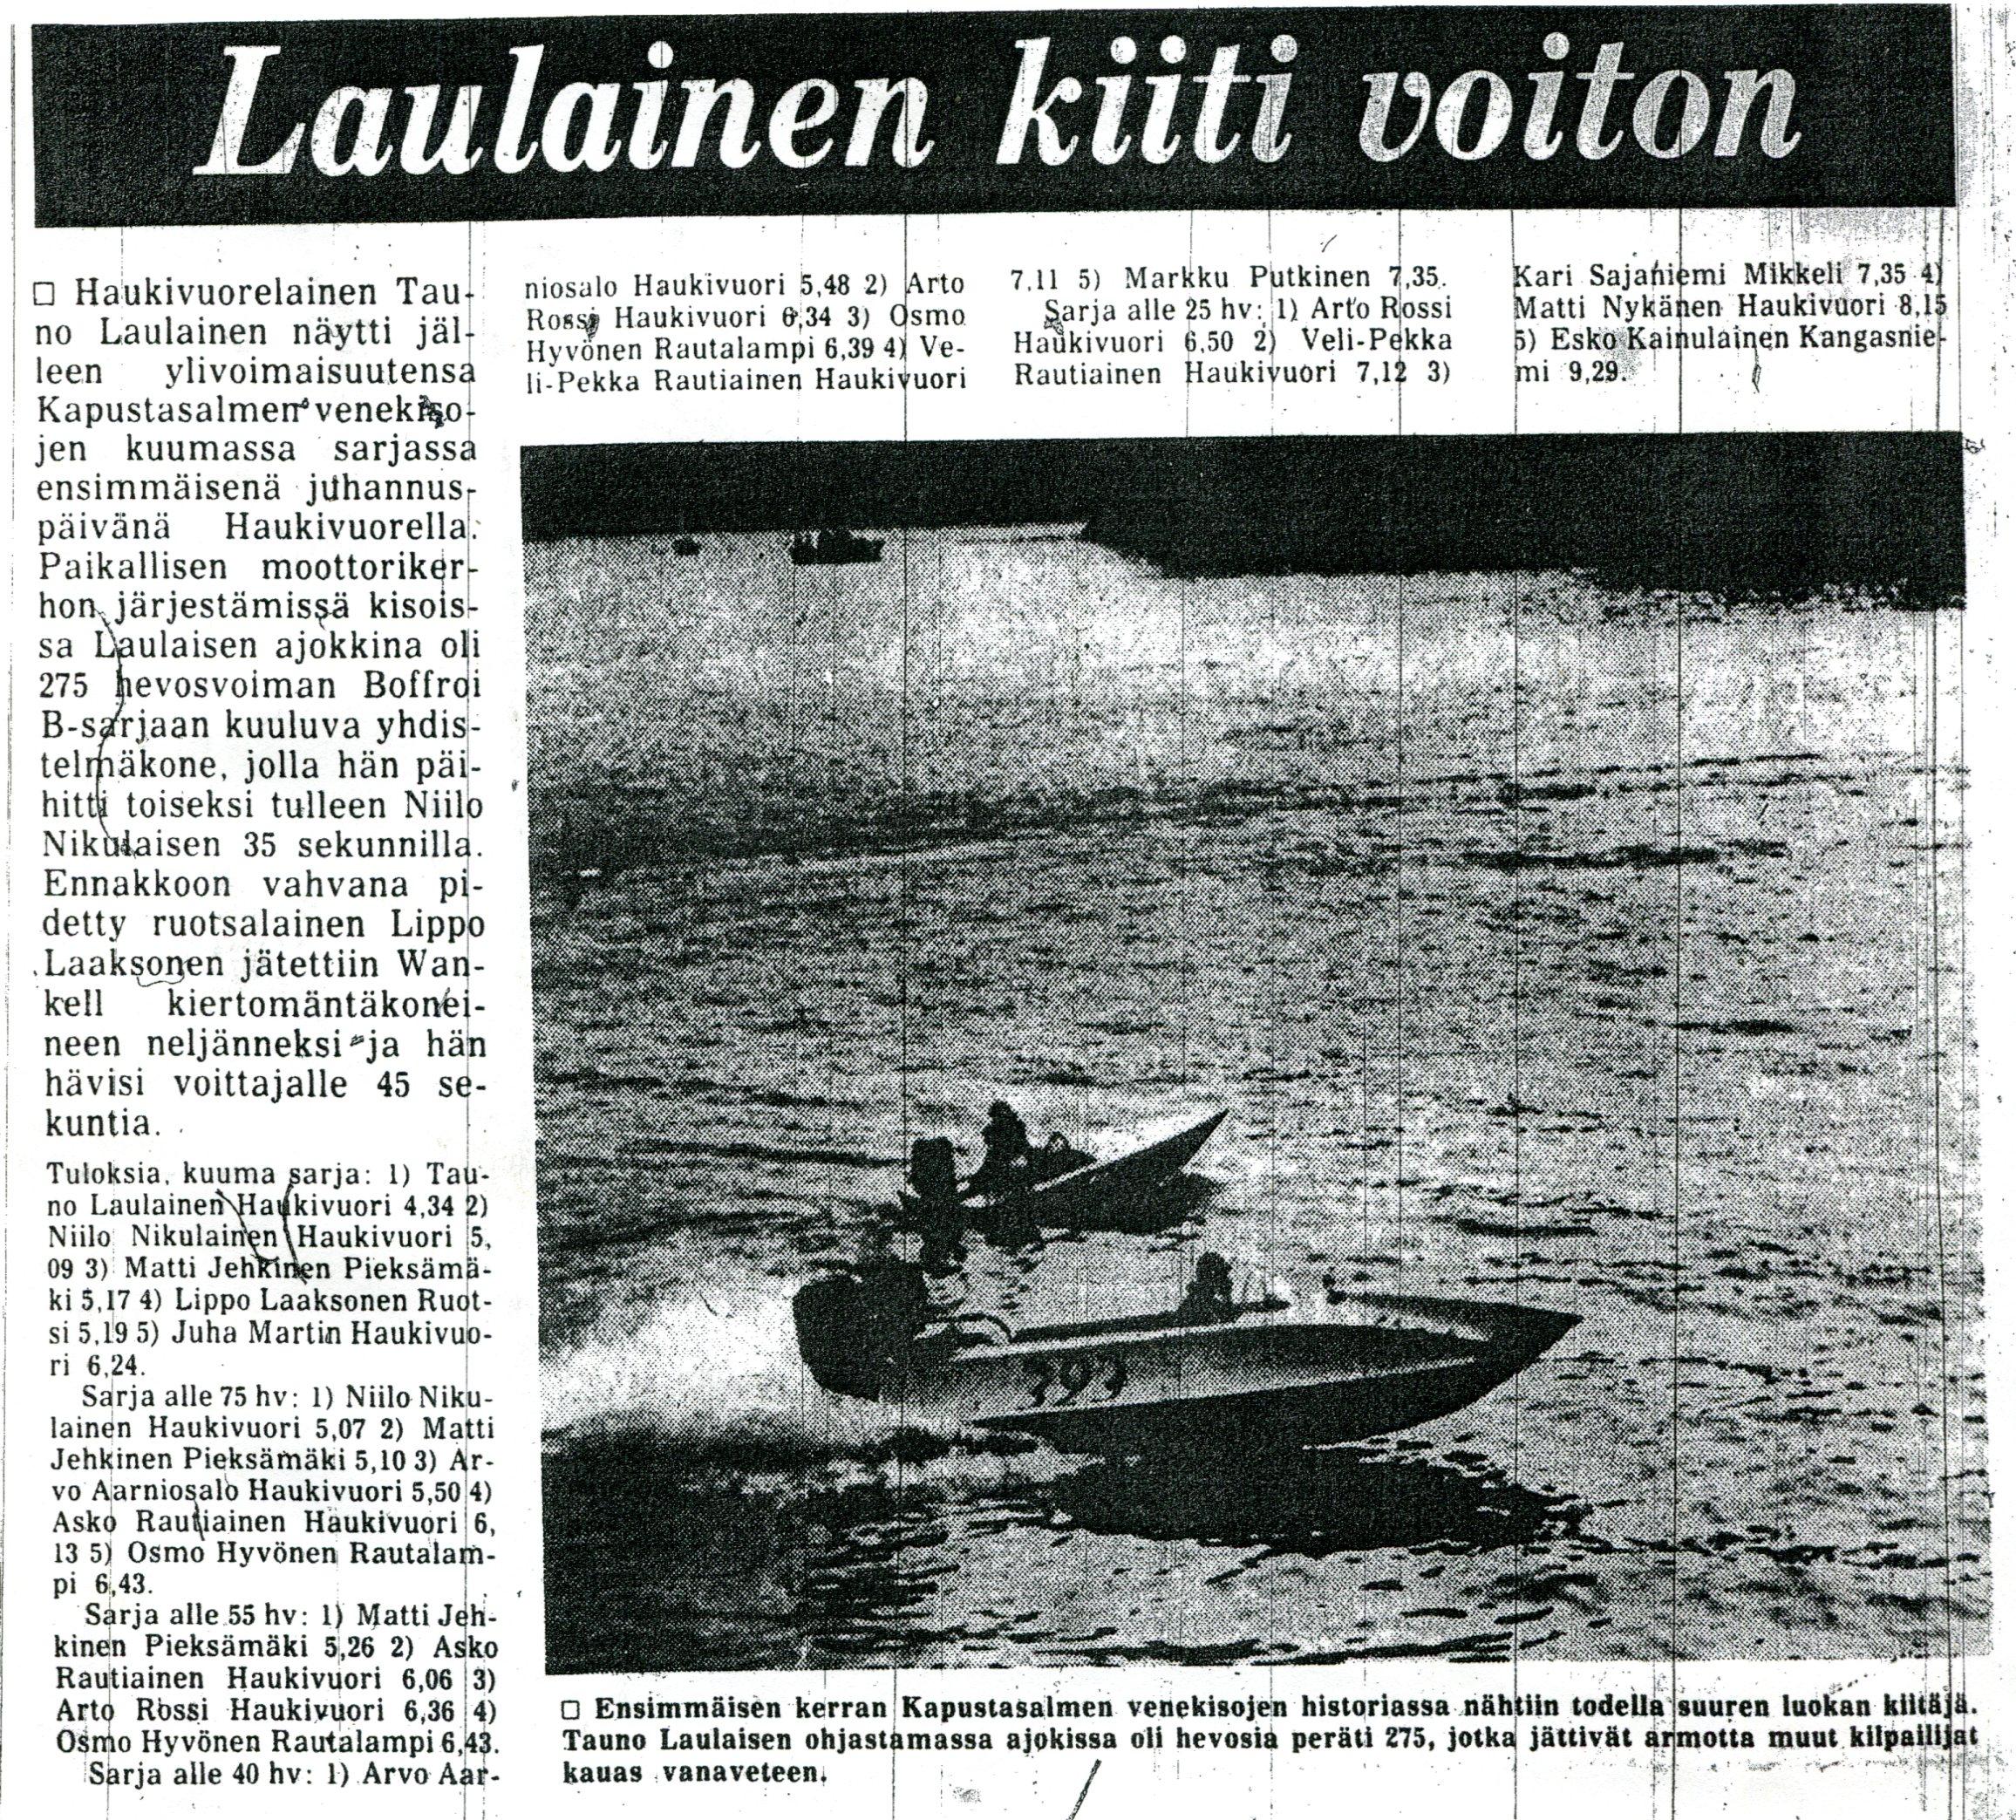 SavonSanomat 23.6.1980